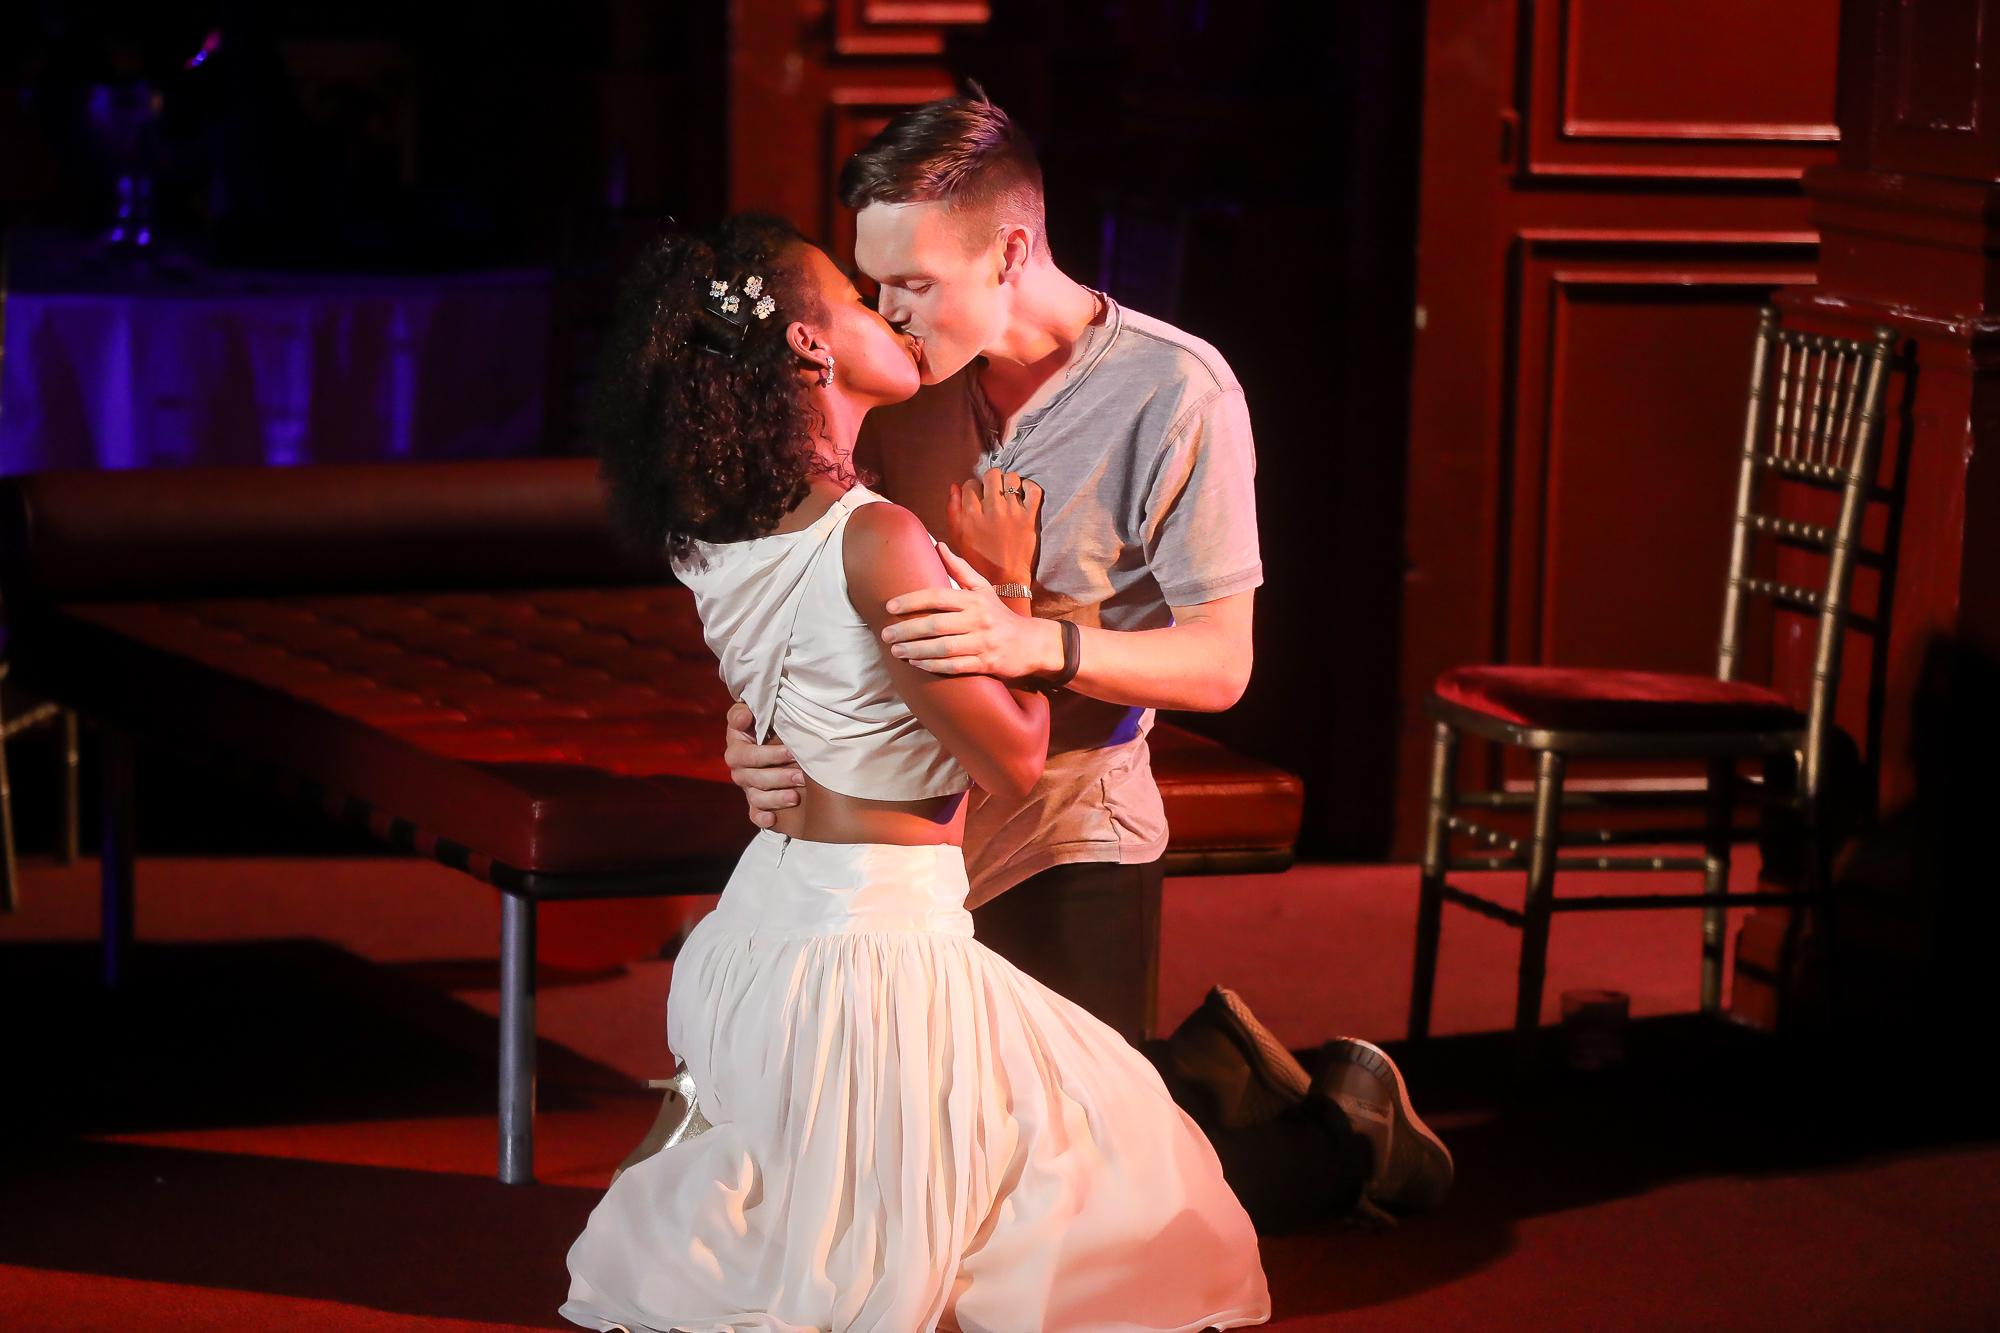 Photo of Danaya Esperanza as Juliet and Sam Lilja as Romeo in Romeo & Juliet by Tony Powell.